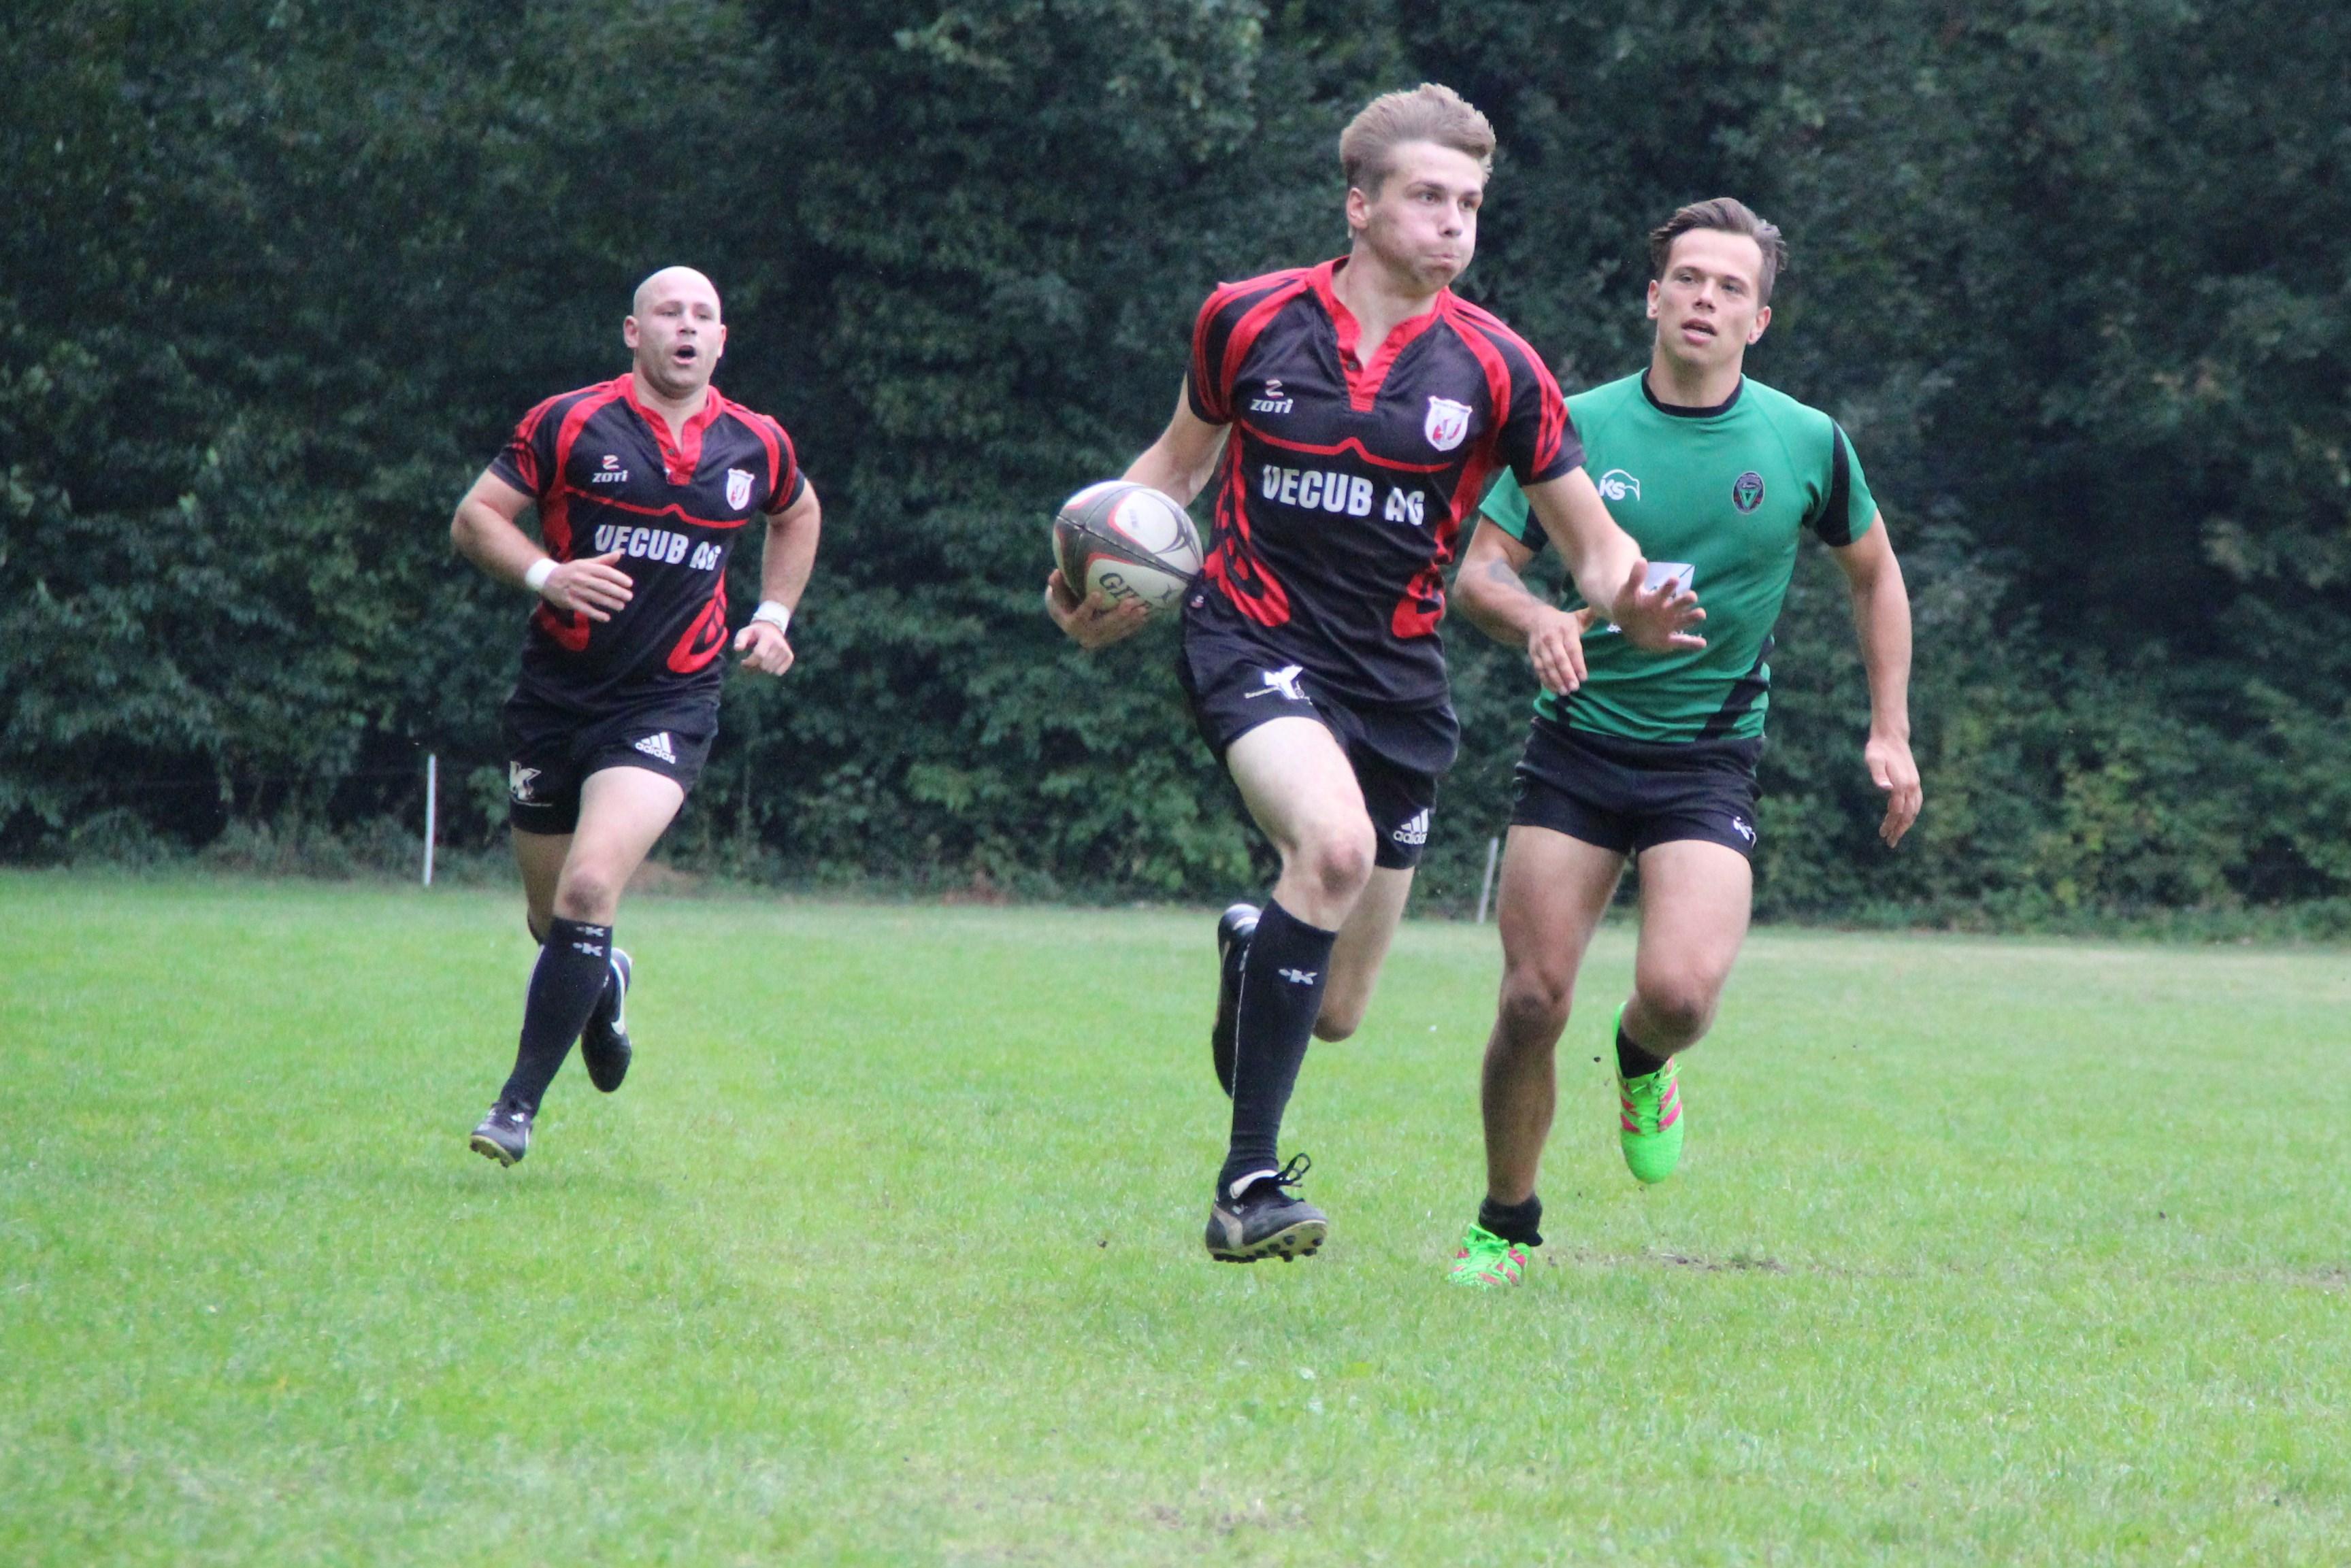 Rugby 17.9.2016 U.M.103